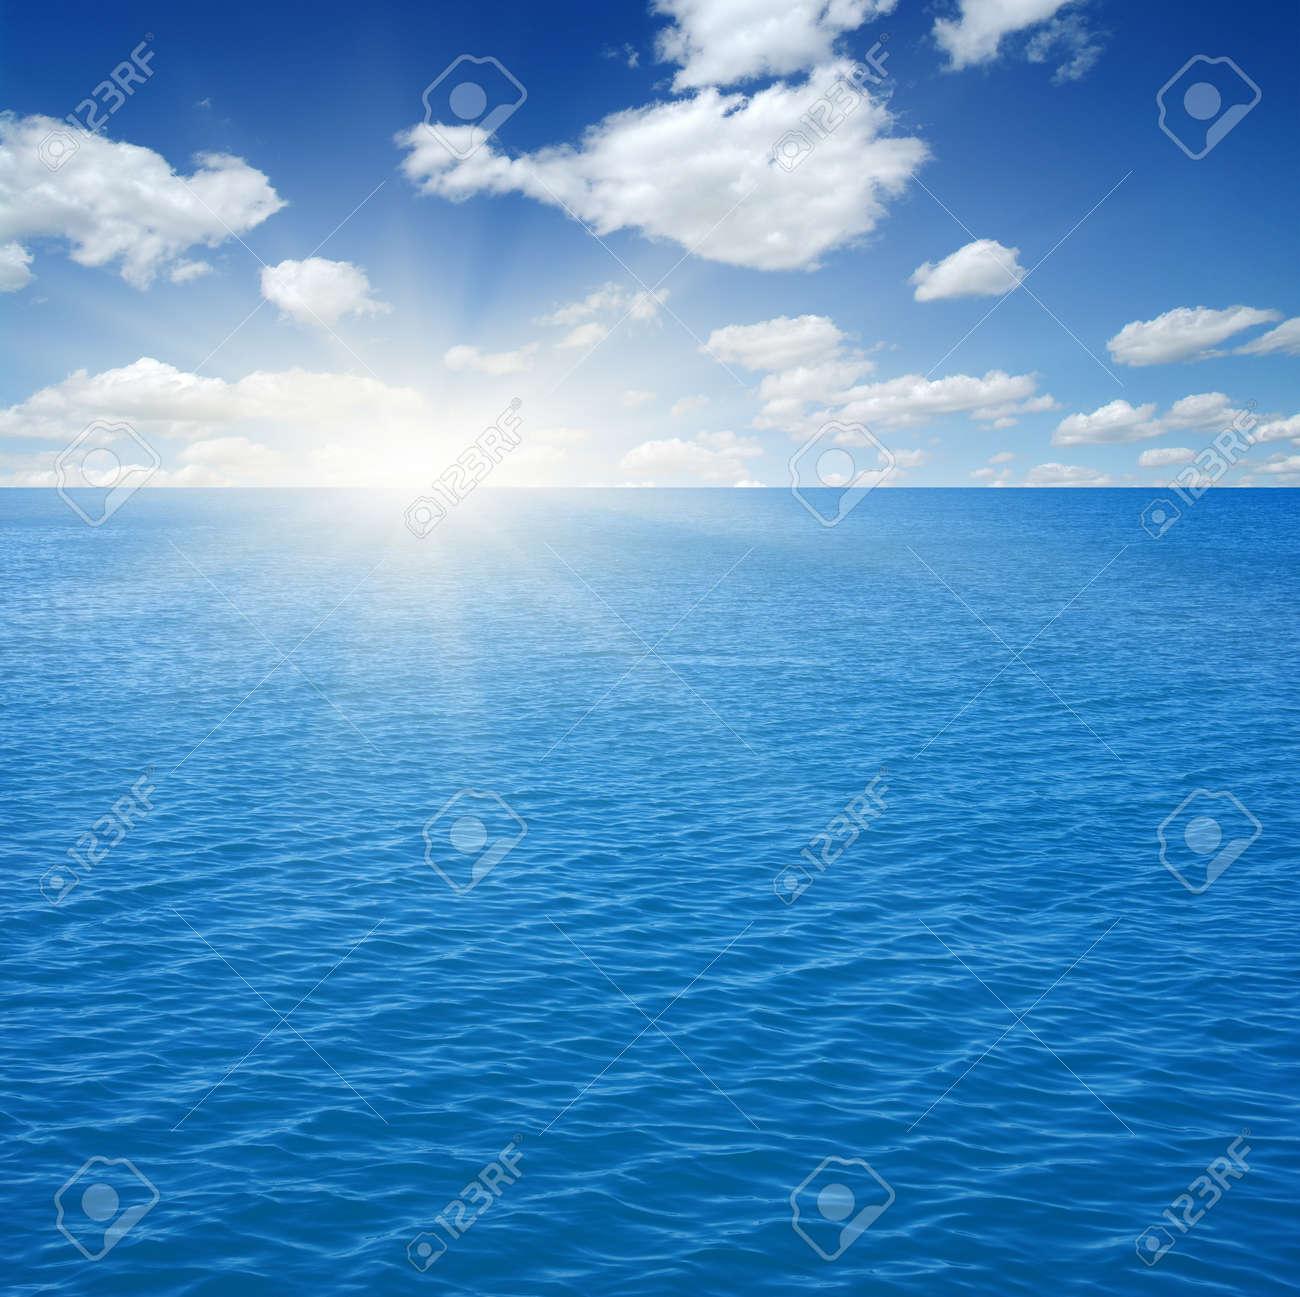 Blue sea and sun on sky - 157355404